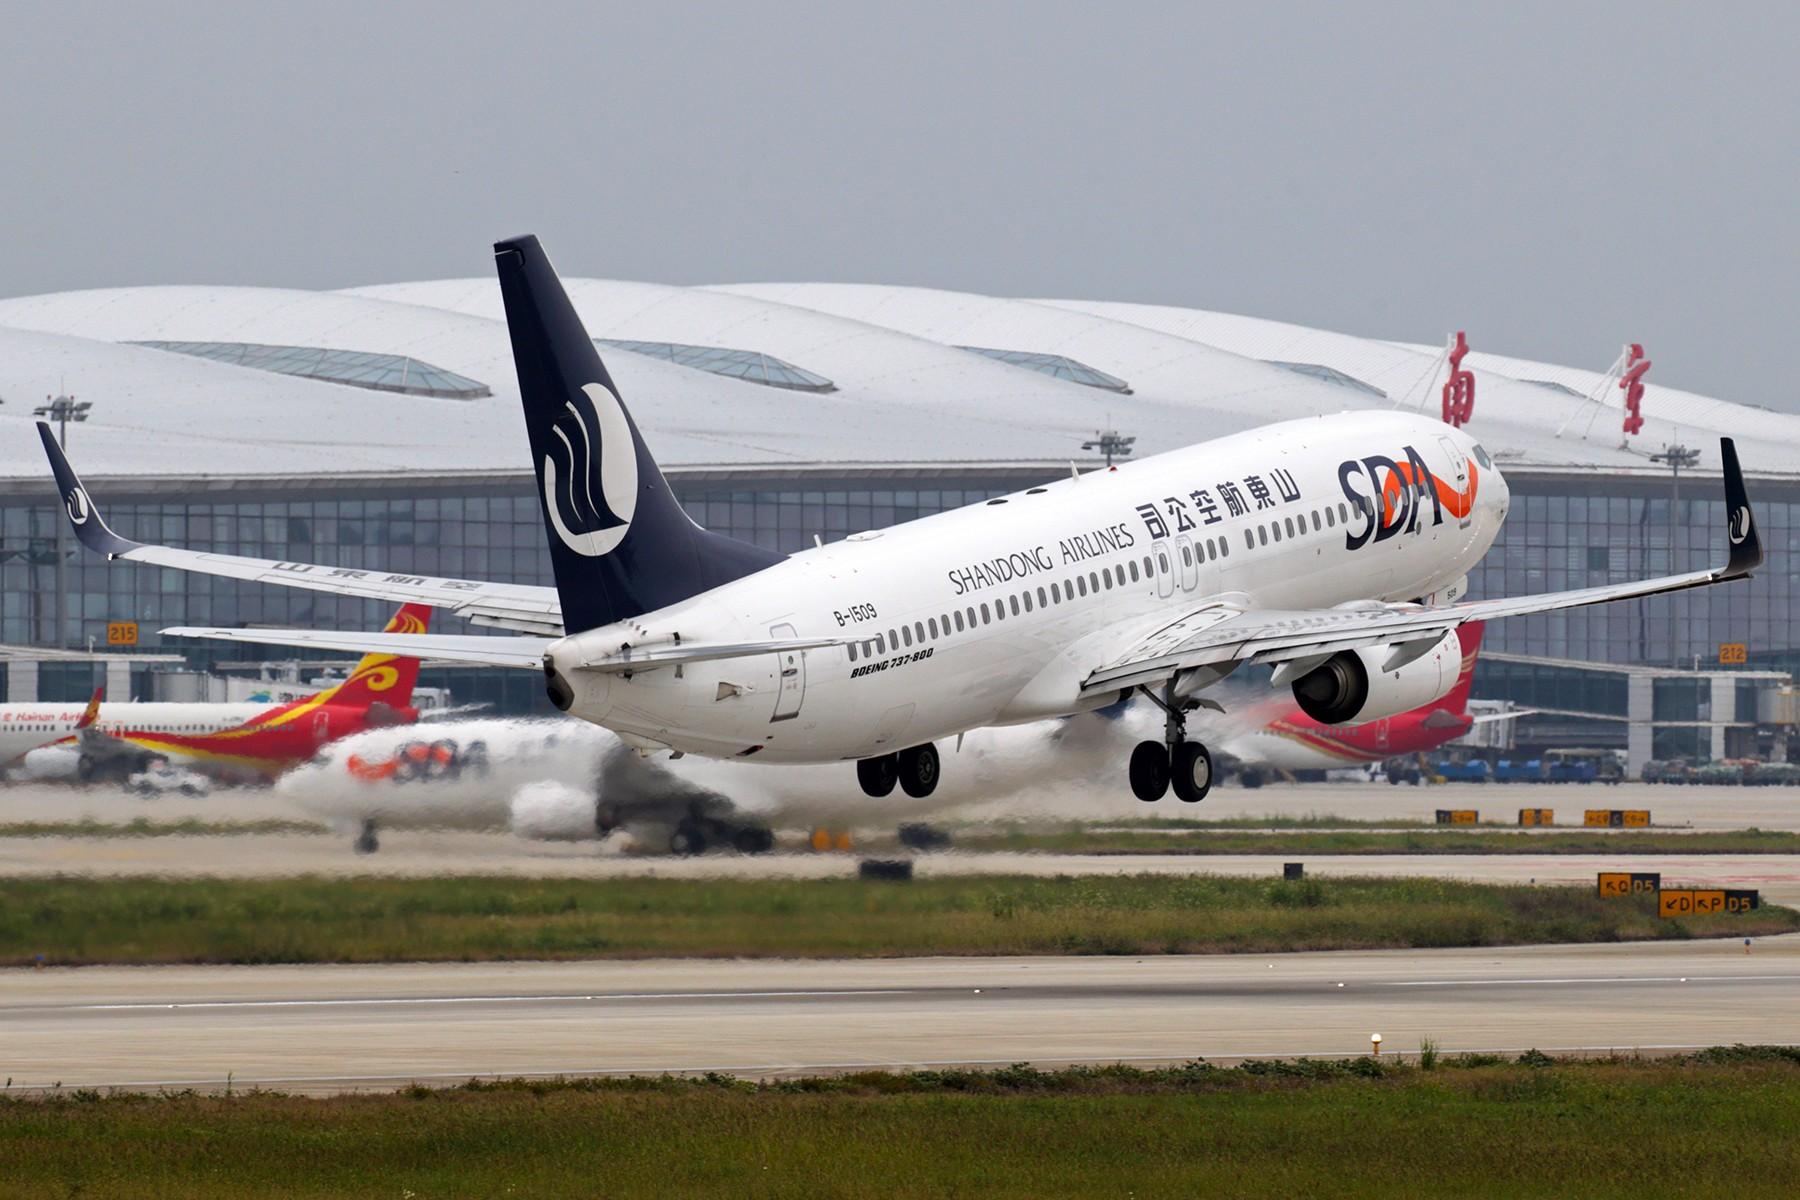 Re:[原创]【BLDDQ】******NKG07/25单跑道运行中****** BOEING 737-800 B-1509 中国南京禄口国际机场